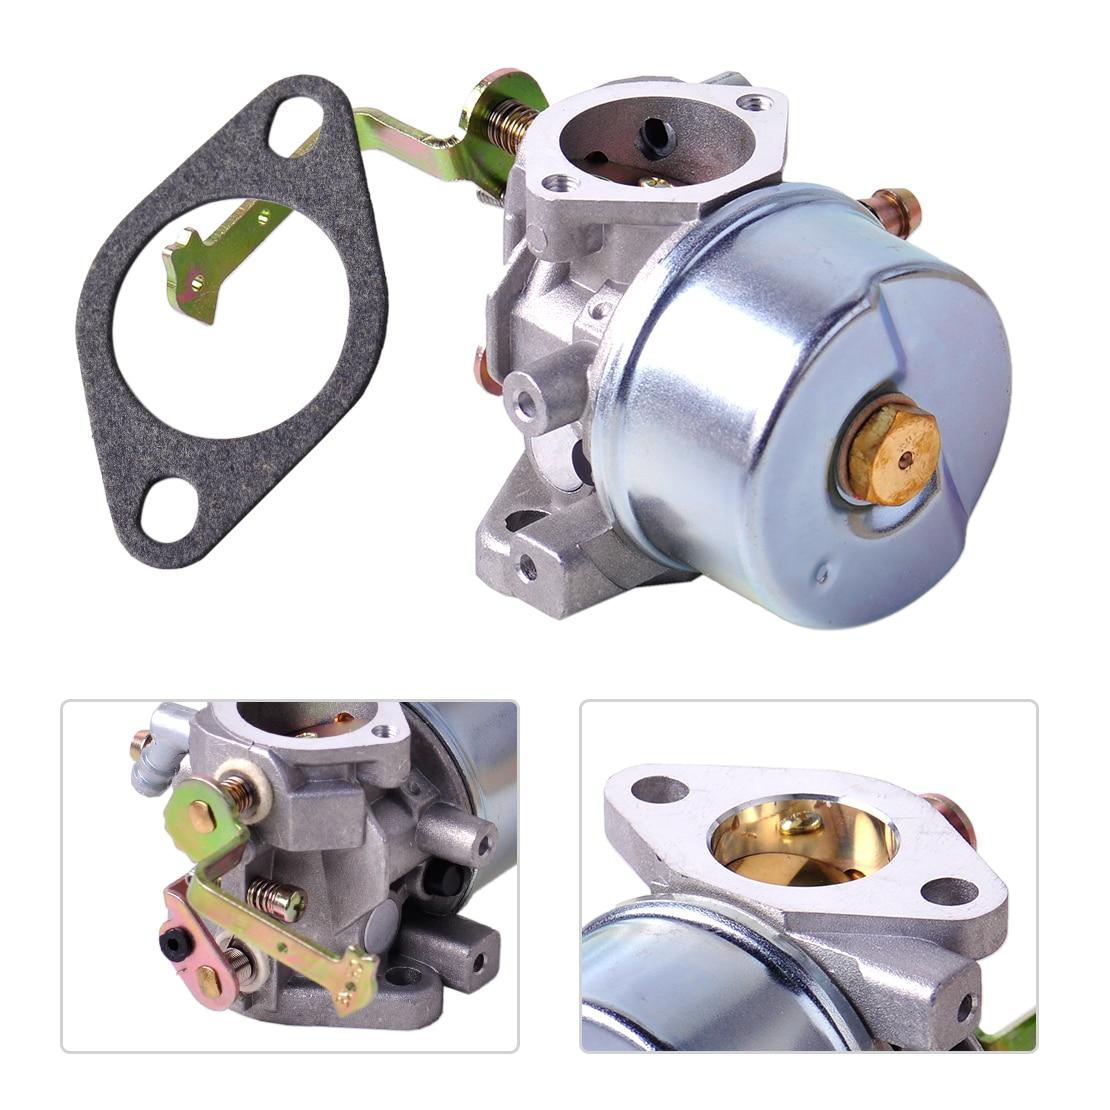 Carburador carburador Junta 640260 640152 apto para Tecumseh 8Hp 10Hp HM80 HM85 HM90 LH318XA LH358XA